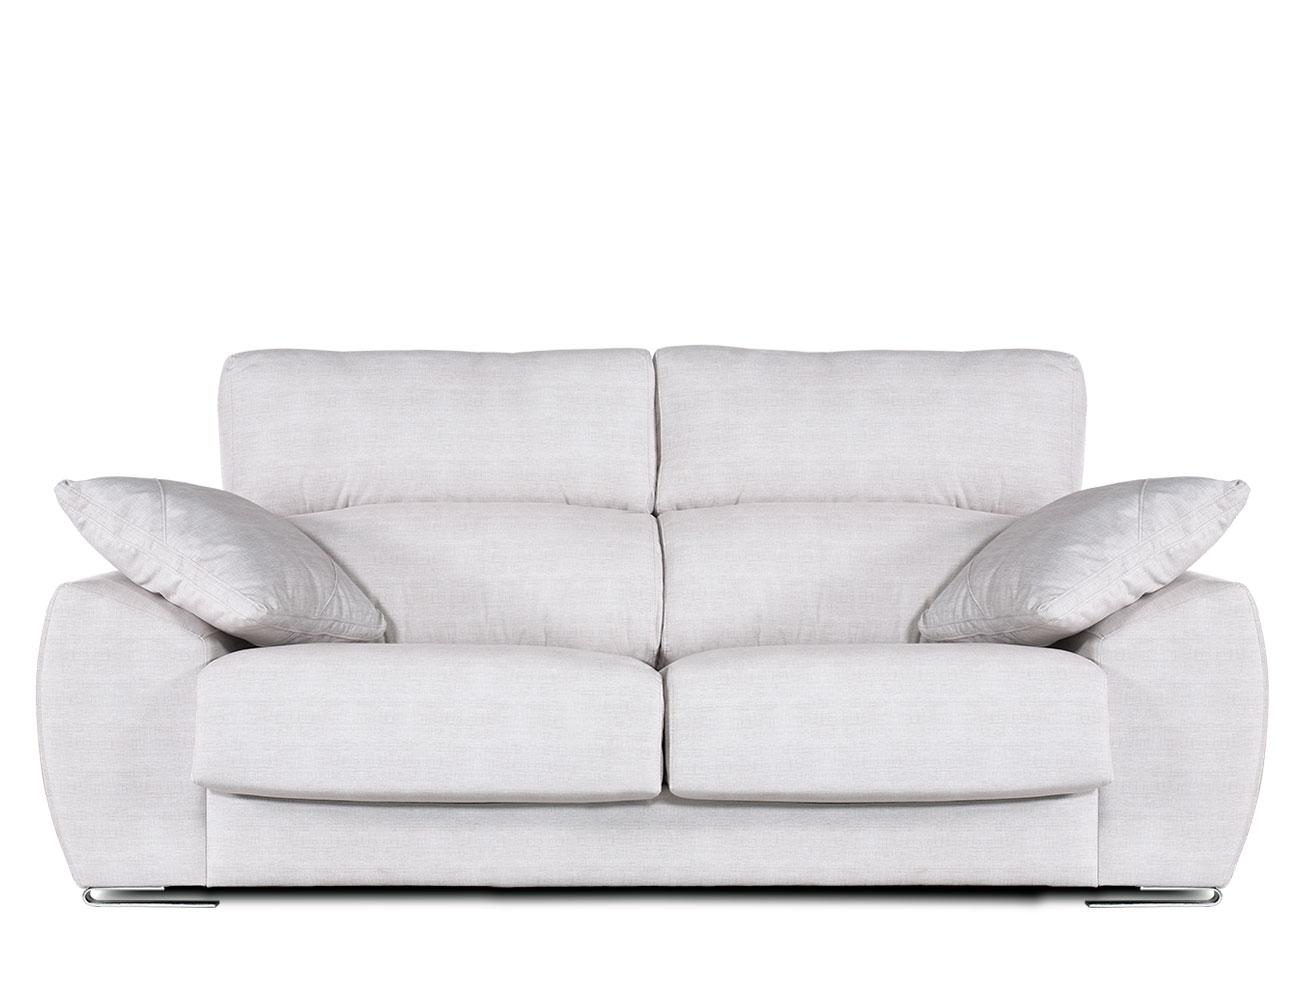 Sofa moderno 3plazas3